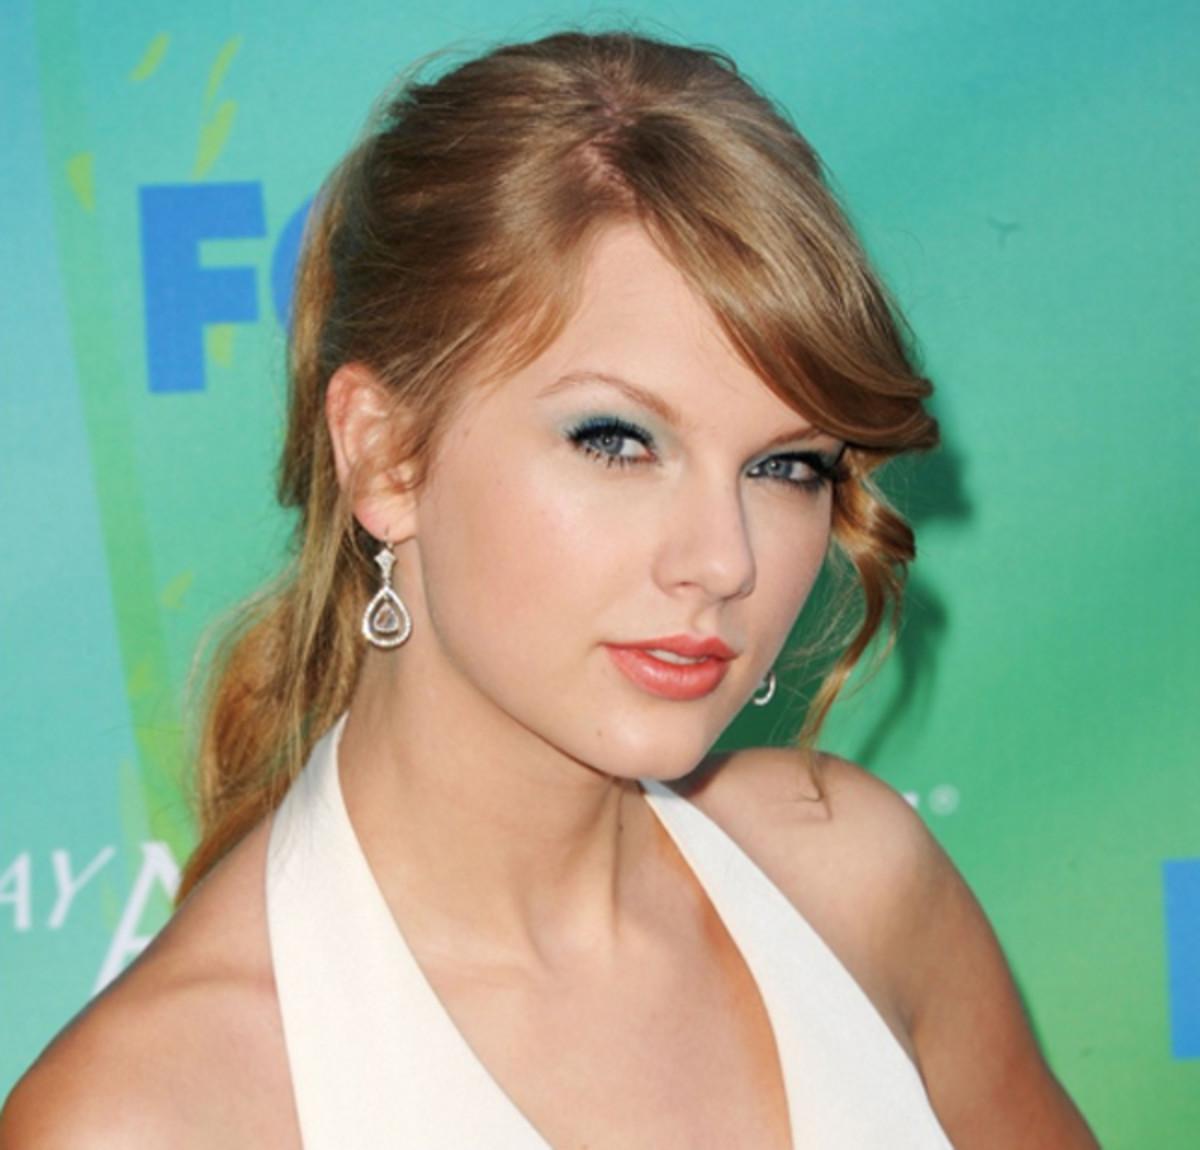 Teen-Choice-Awards-2011-Taylor-Swift-2